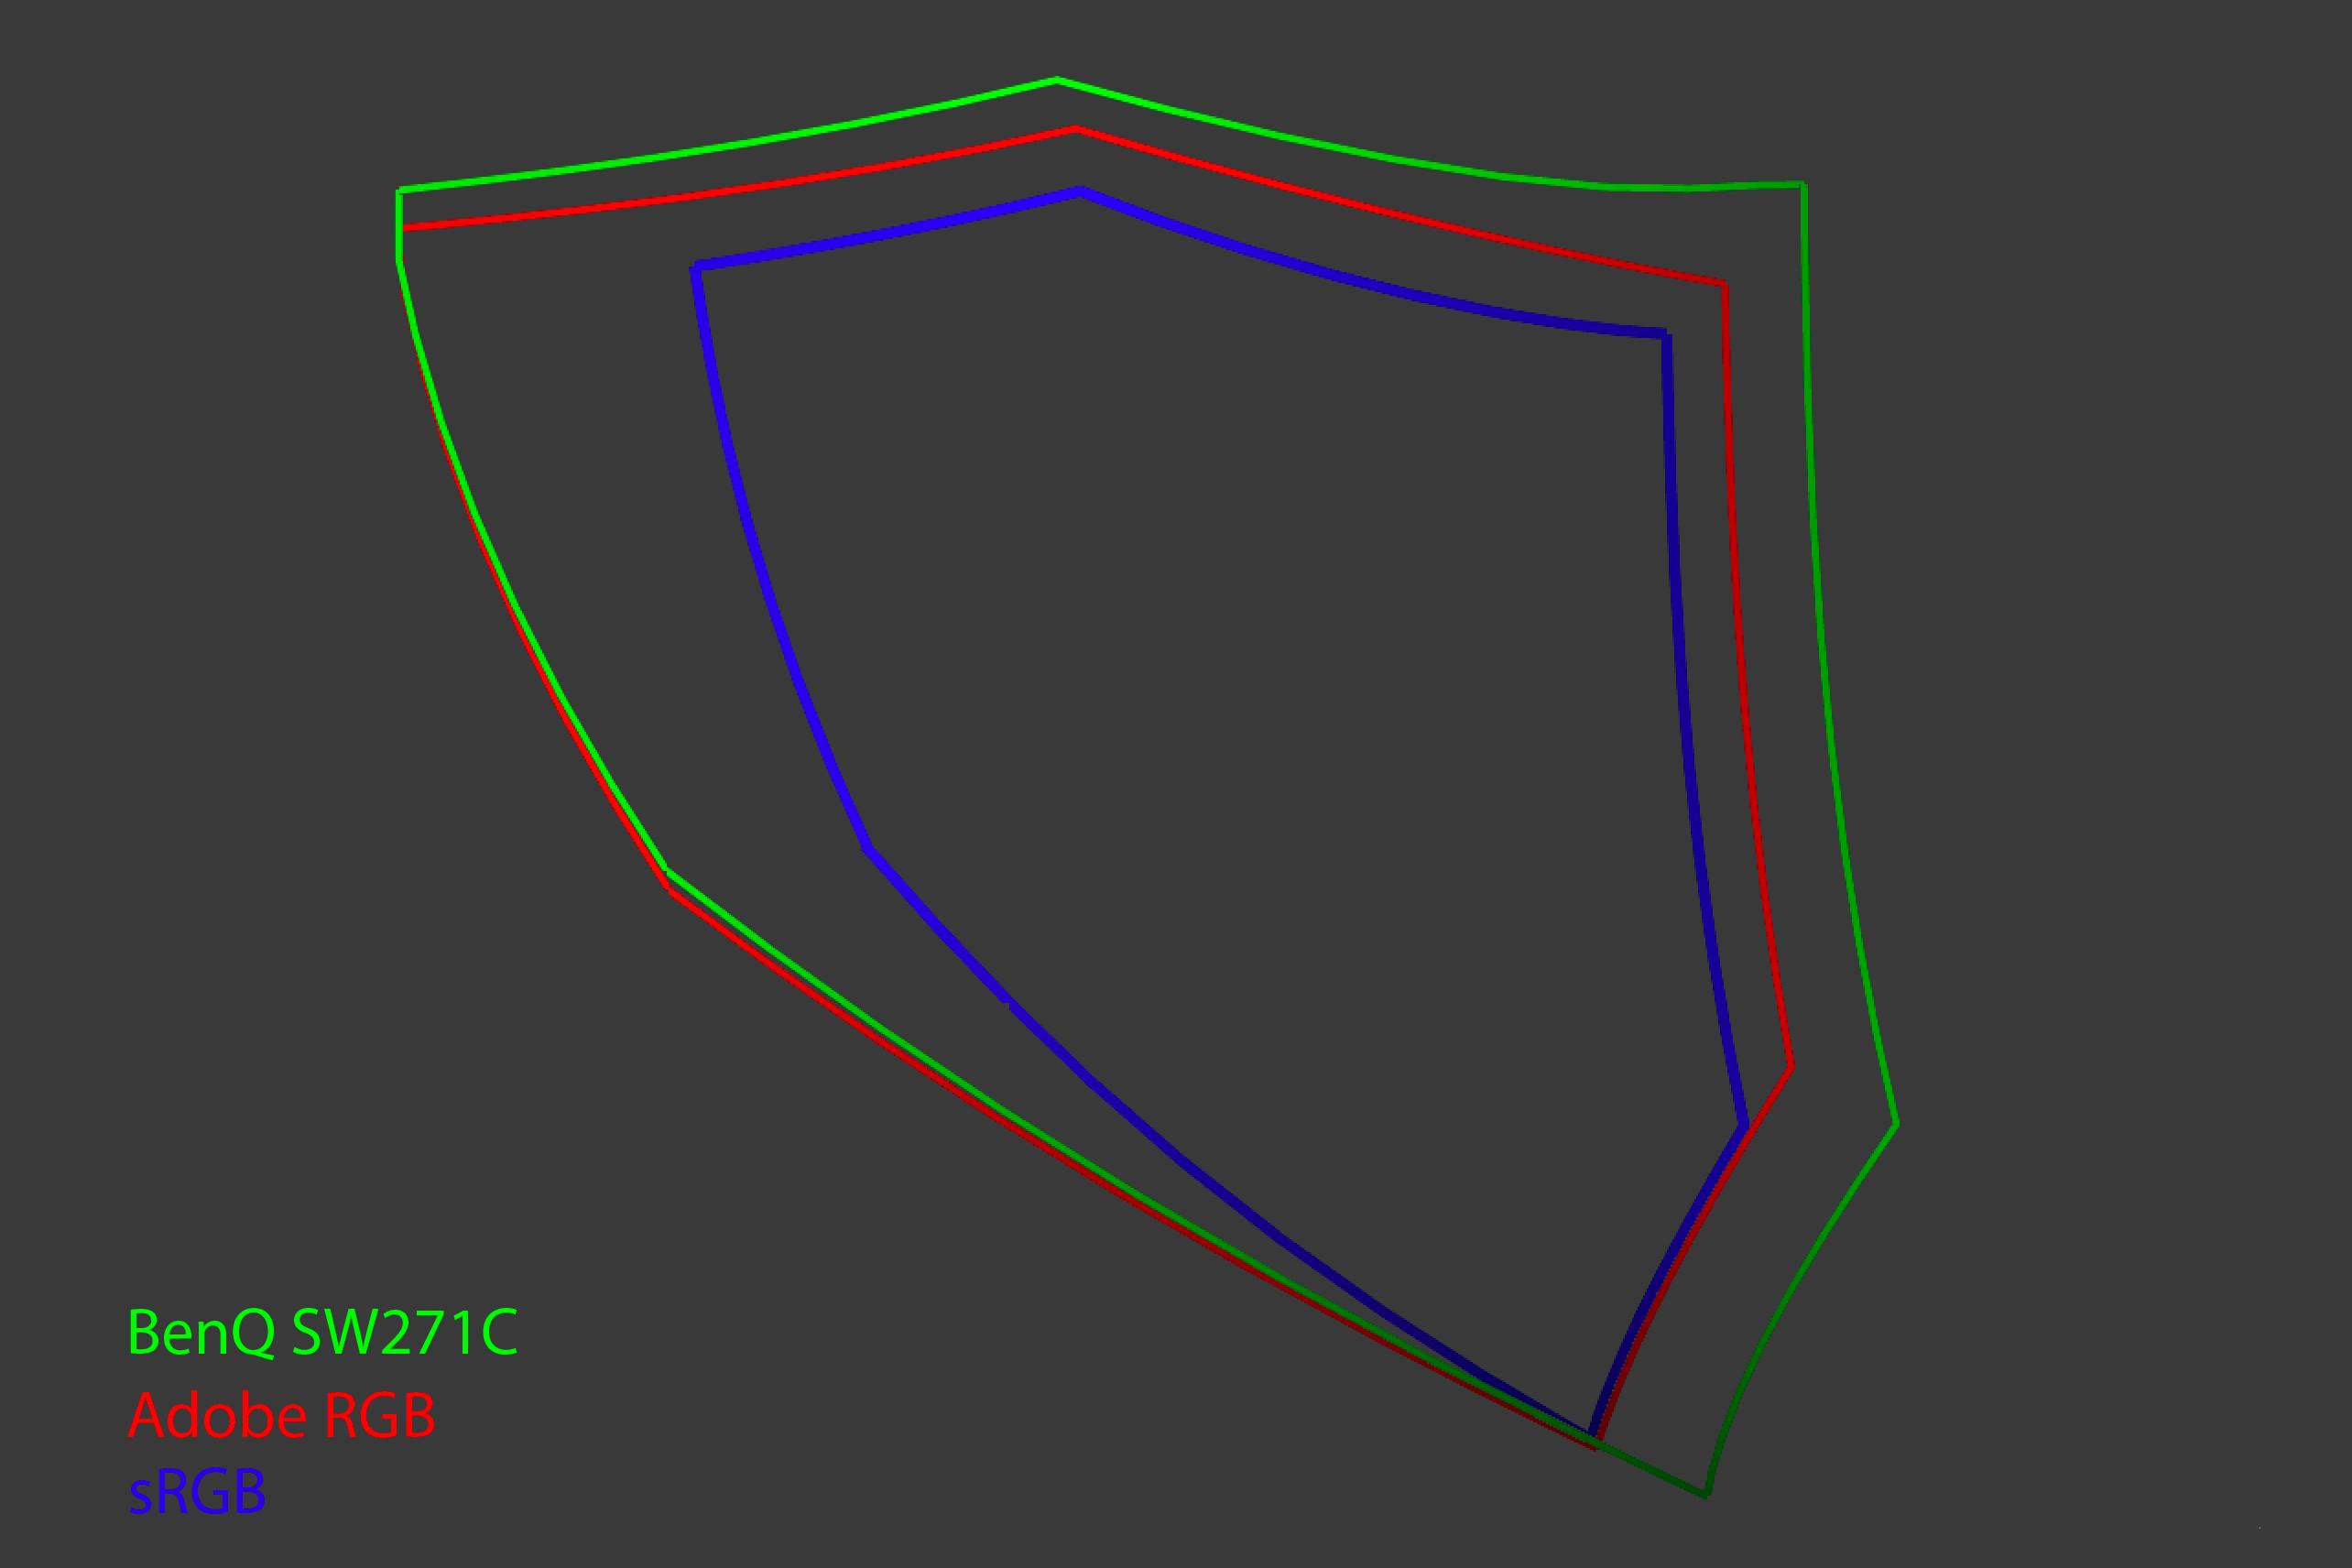 BenQ SW271C Gamut sRGB Adobe RGB